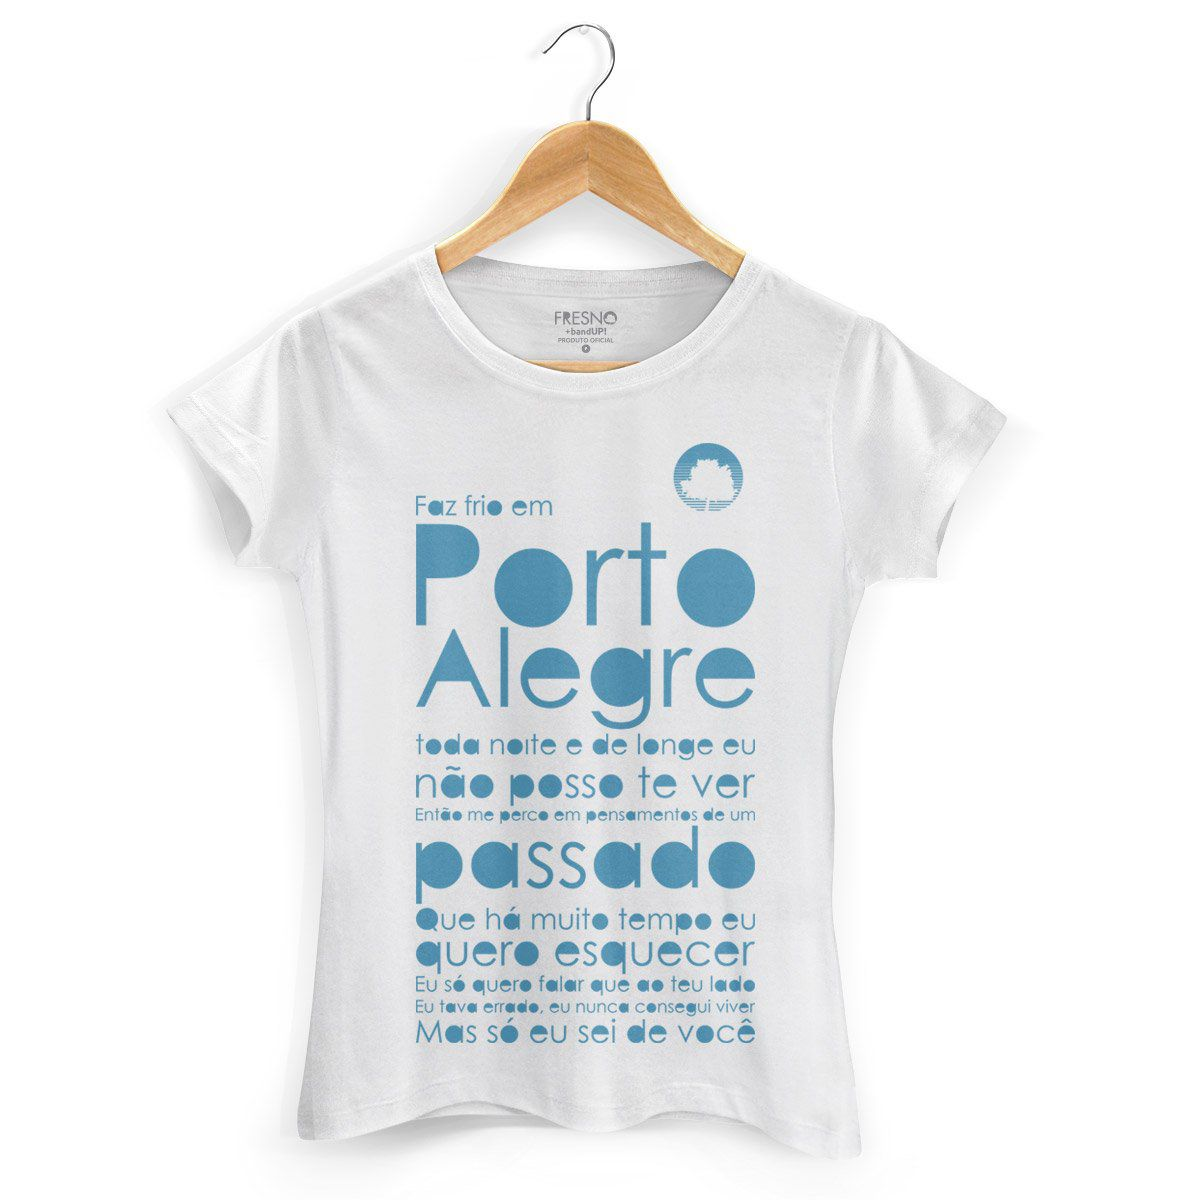 Camiseta Feminina Fresno Porto Alegre